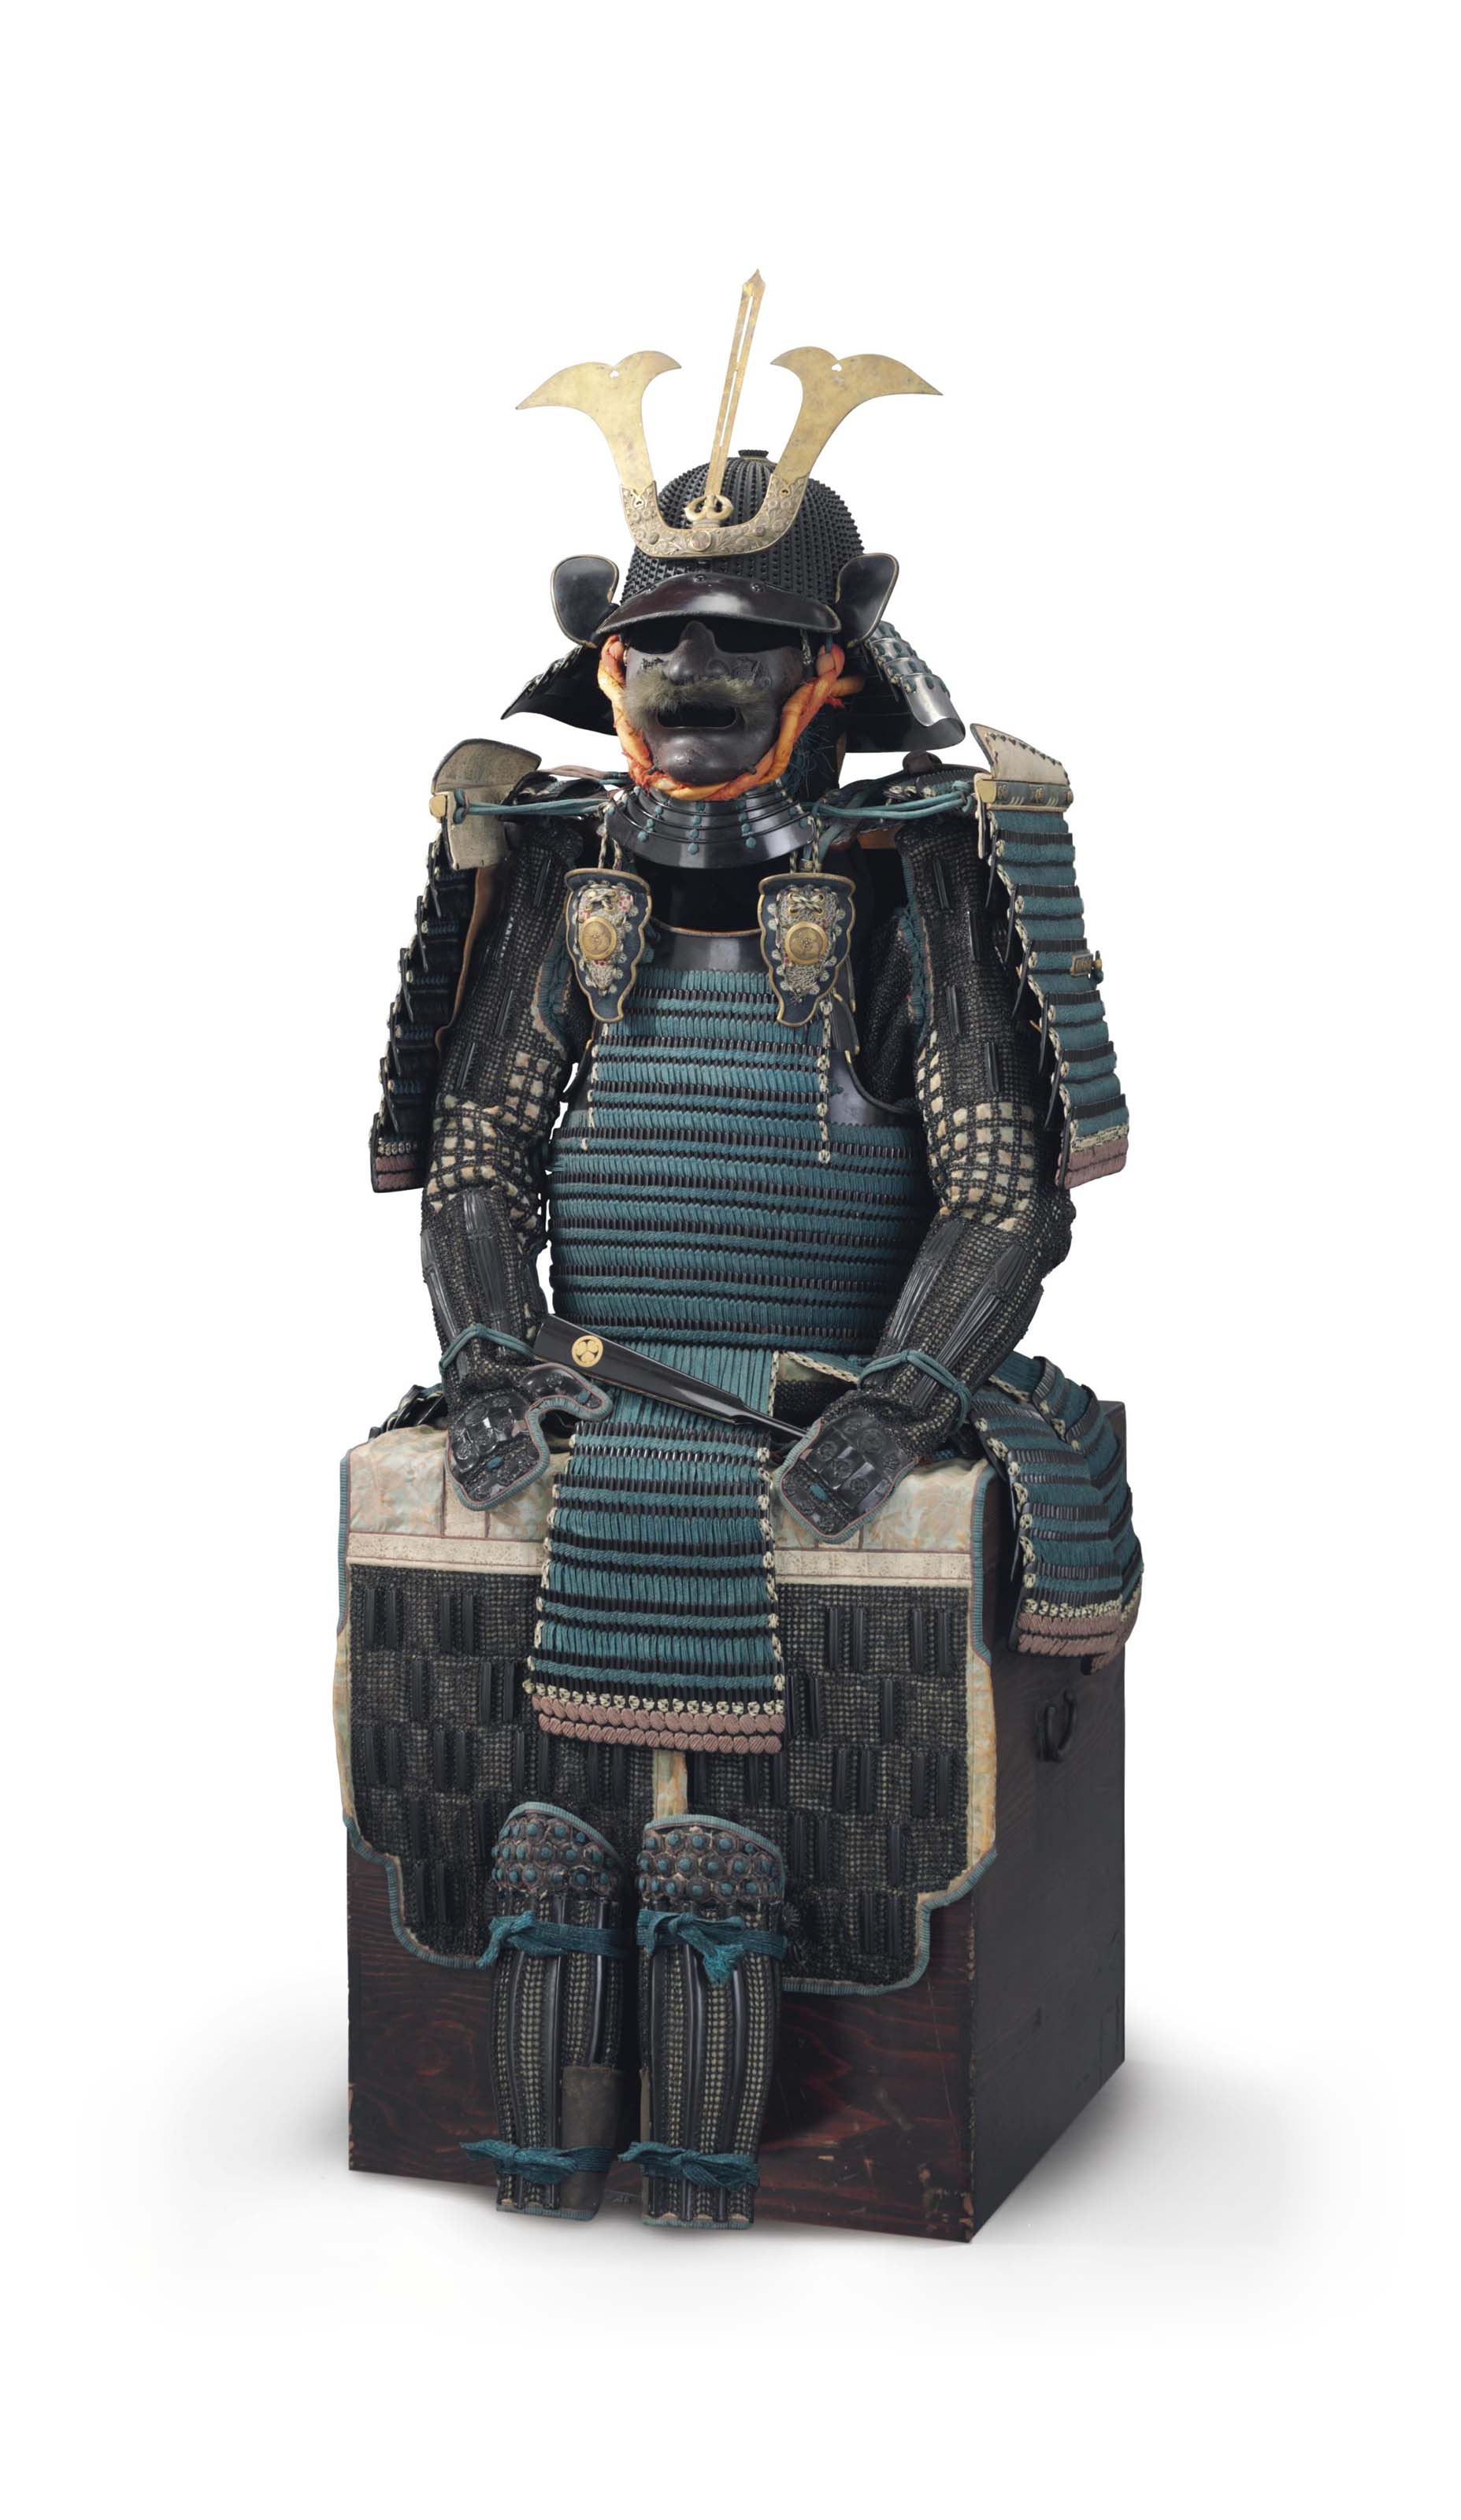 Green laced hon-kozane nimai-do Tokugawa gusoku (armor)